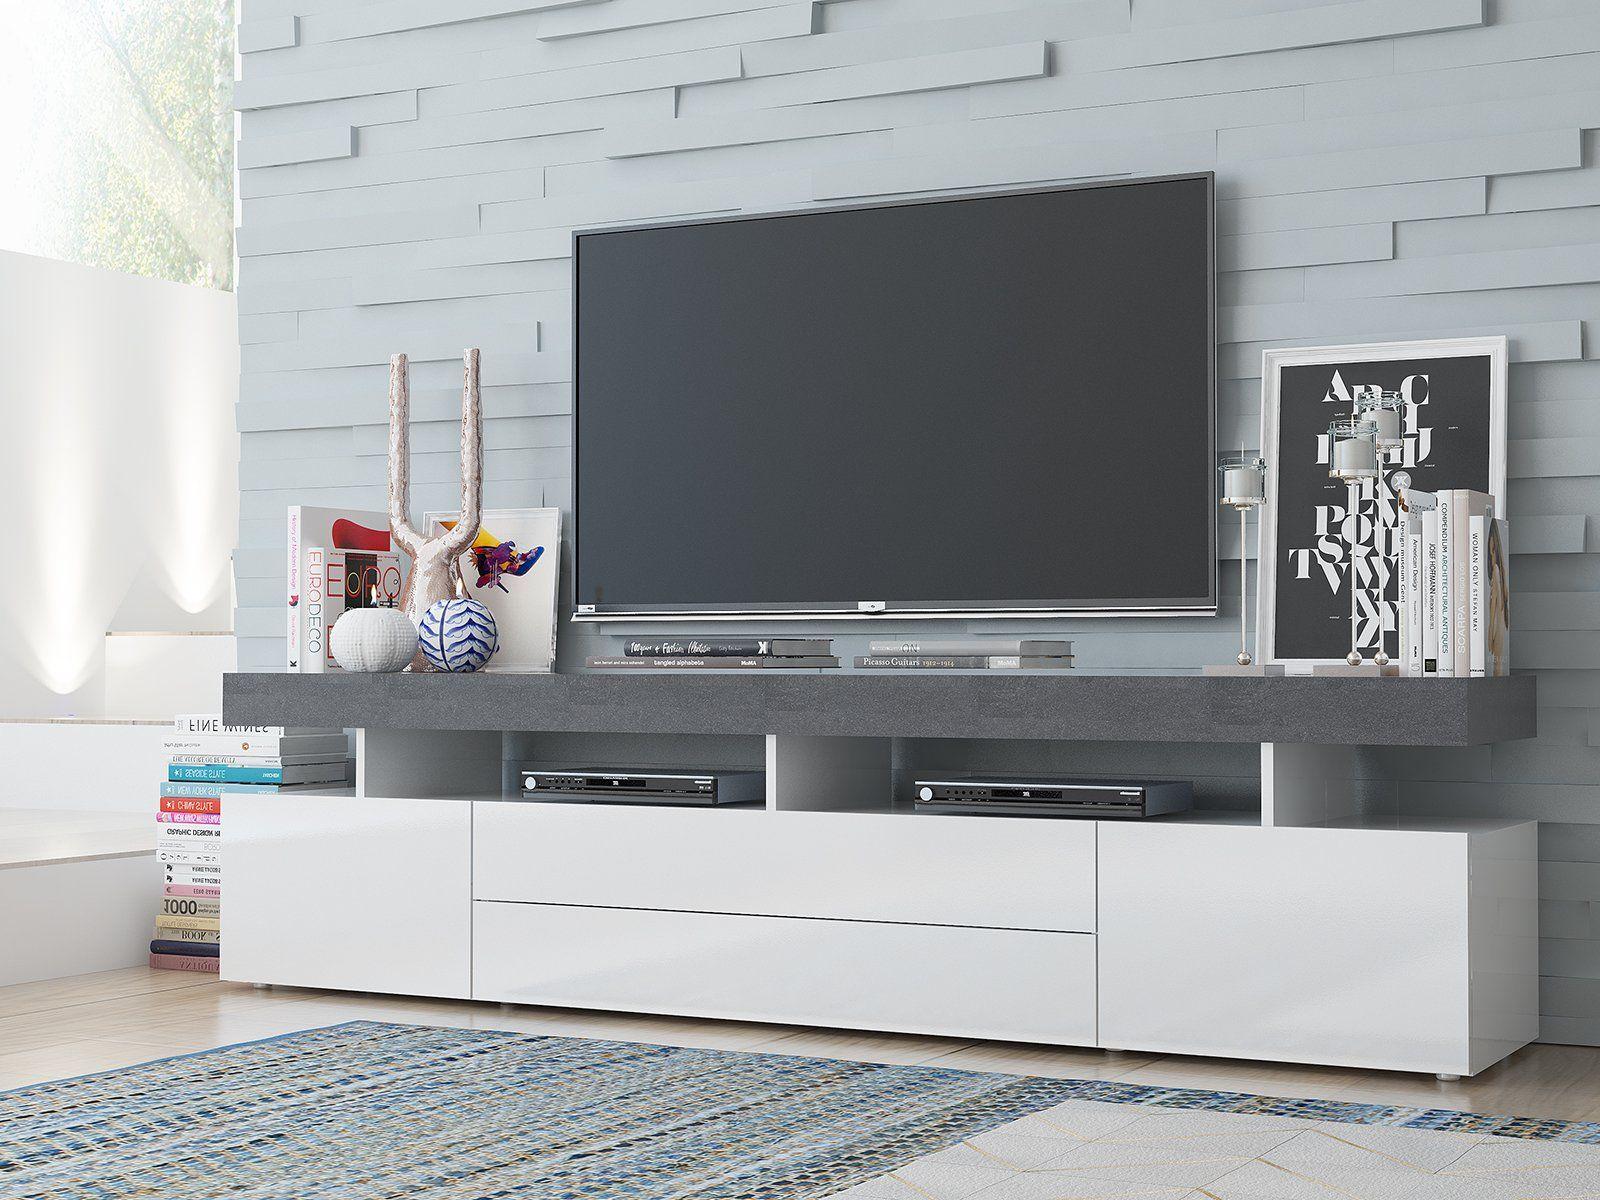 Tv Lowboard Fernsehtisch Unterschrank Sideboard Schrank Hifi Rack Treviso Ii In 2020 Tvs Inspiration Flat Screen